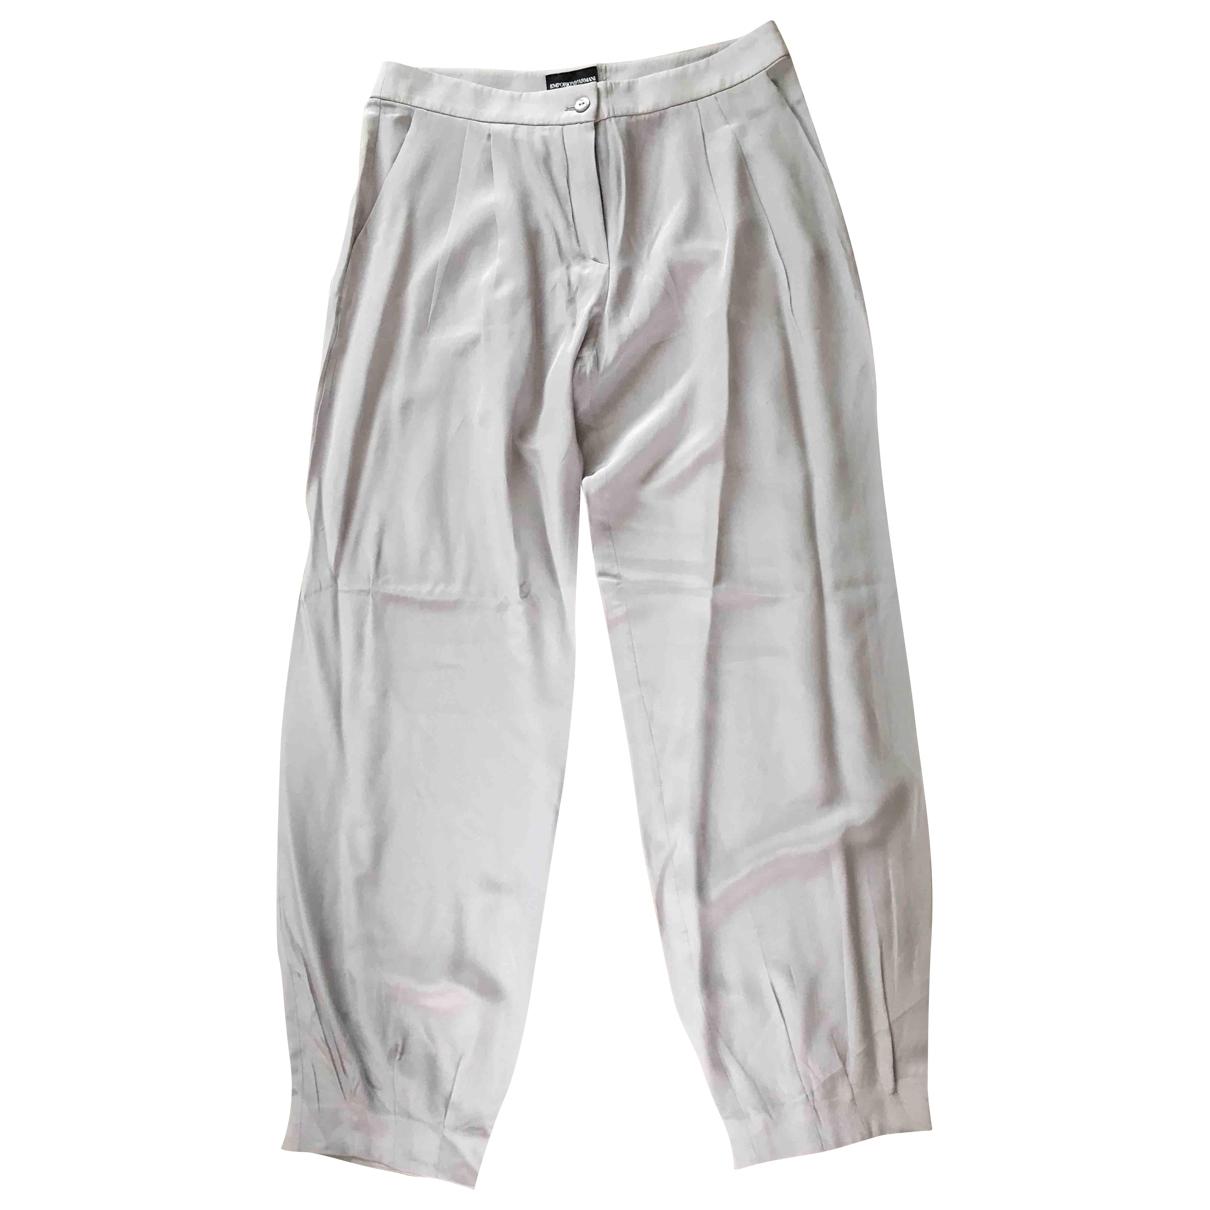 Emporio Armani \N Beige Trousers for Women 42 IT